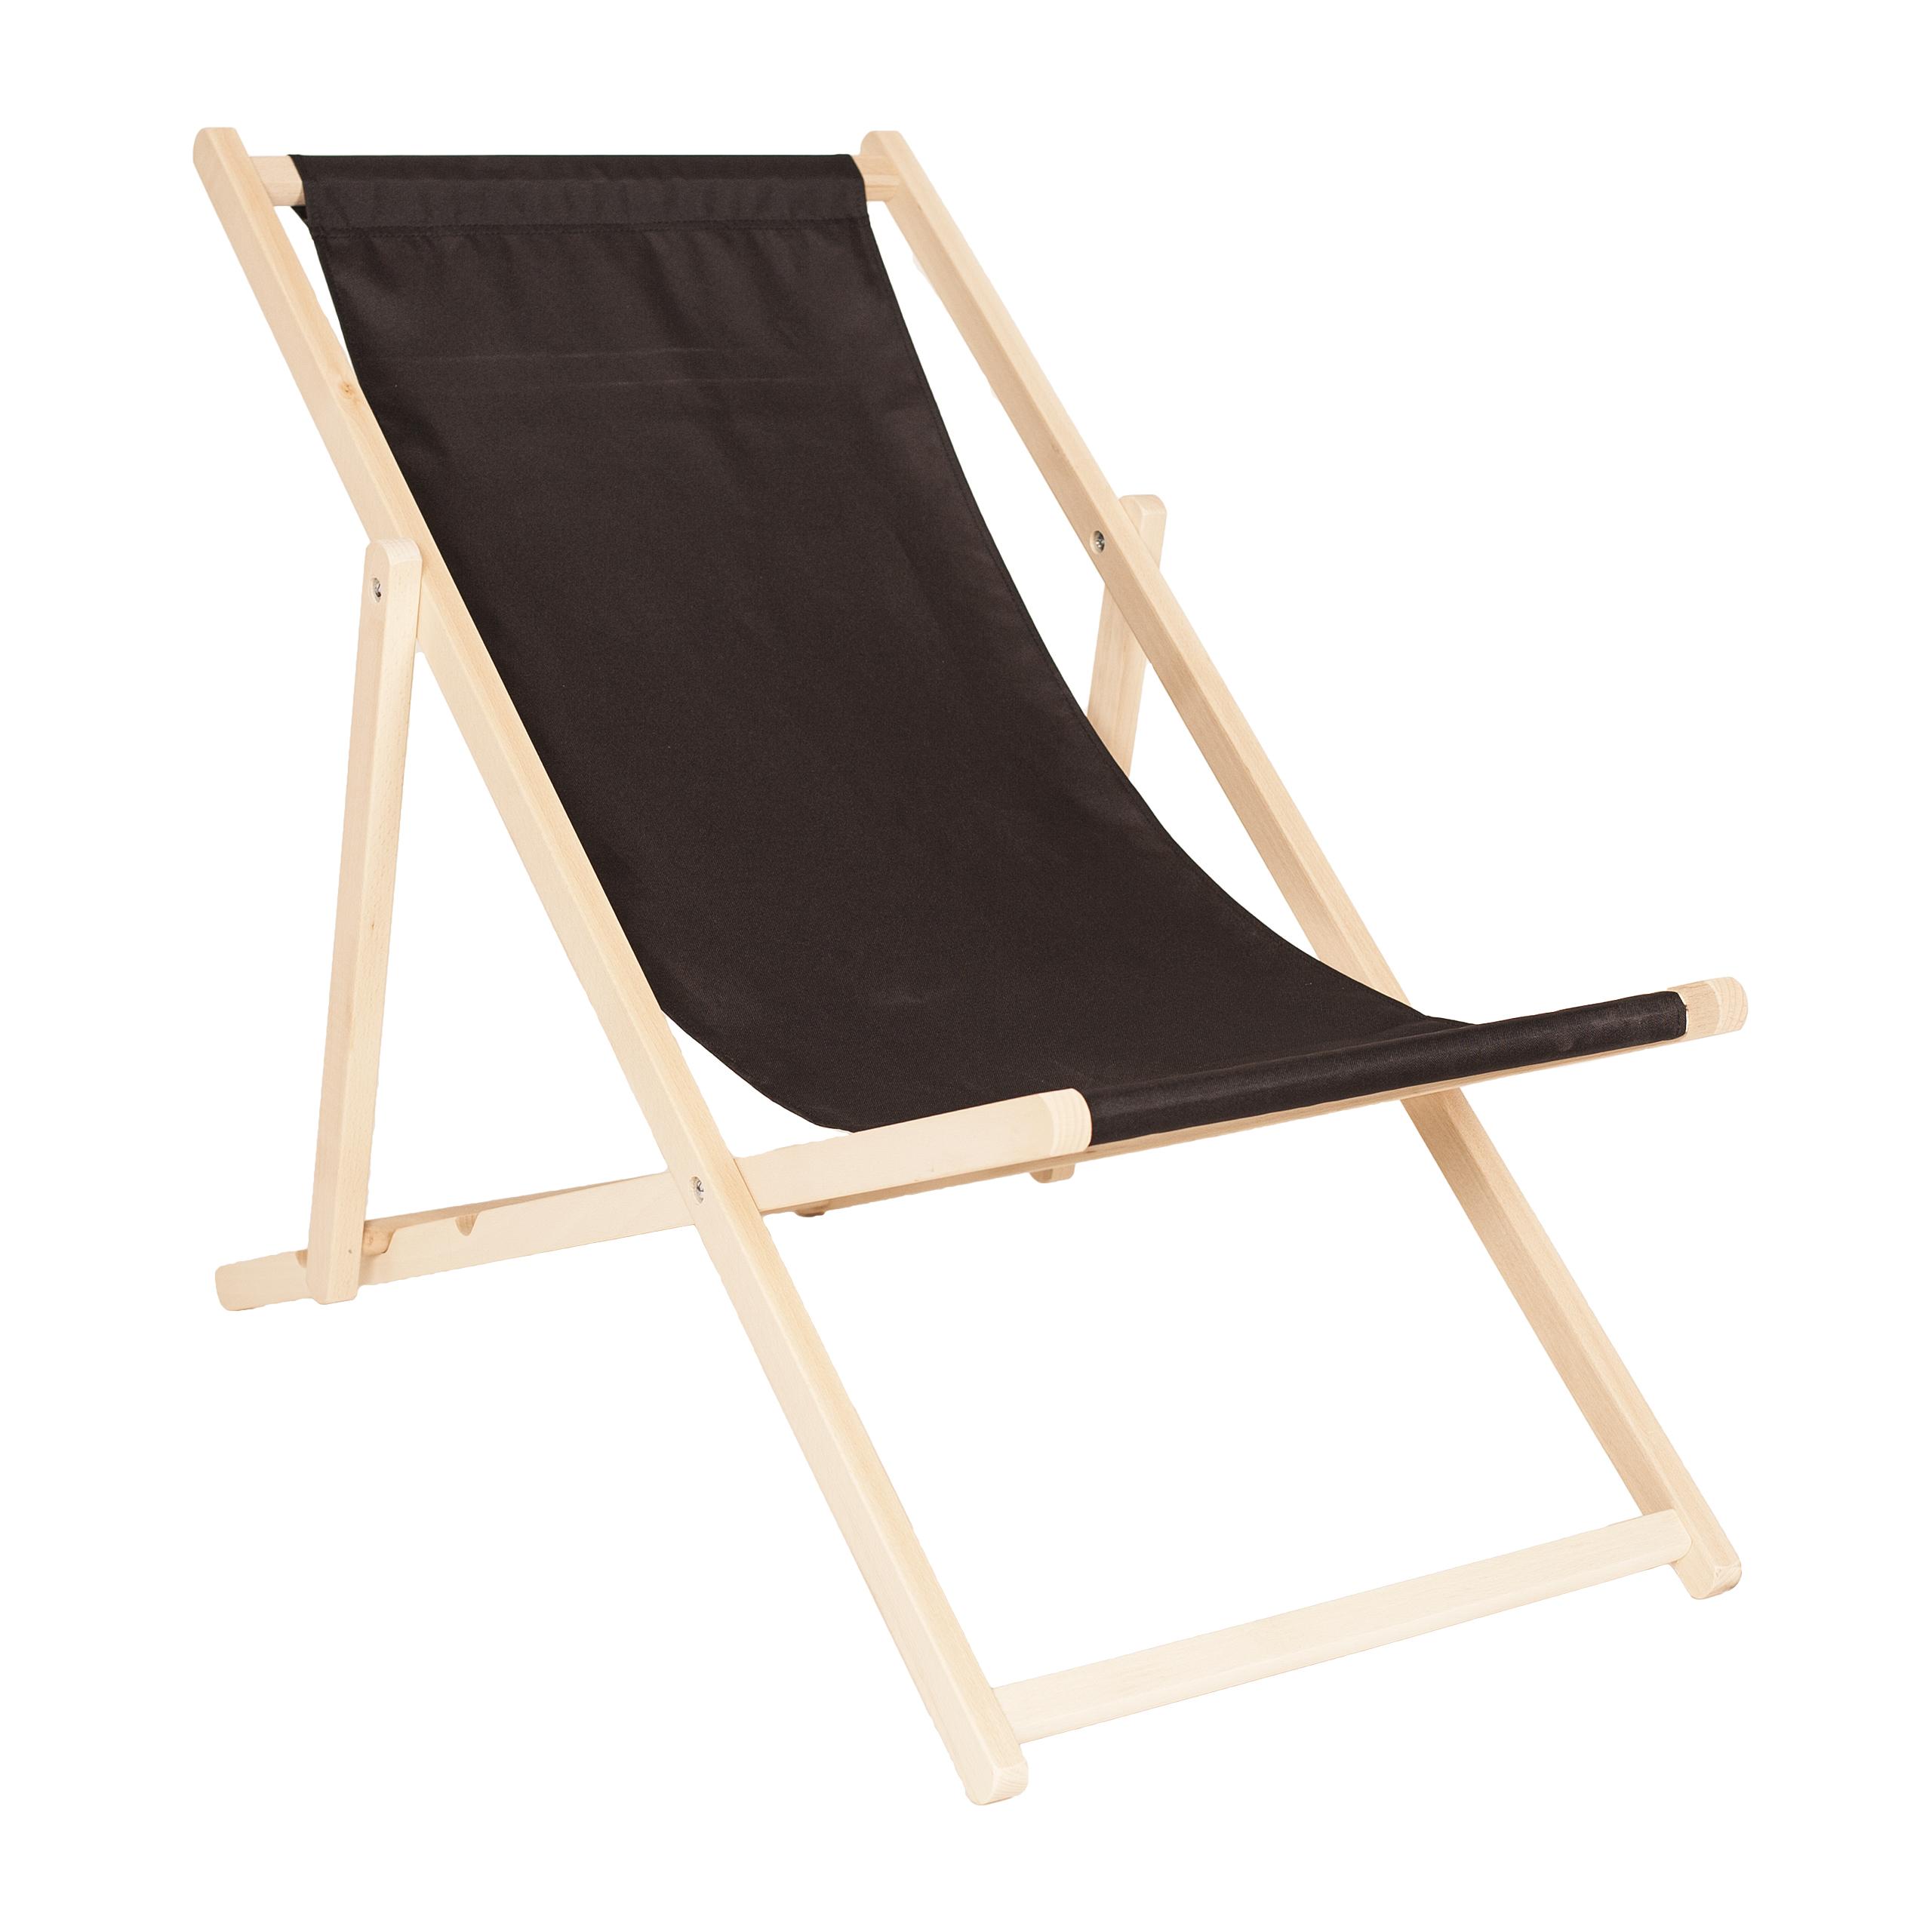 Wooden Deck Chair CLASSIC BLACK